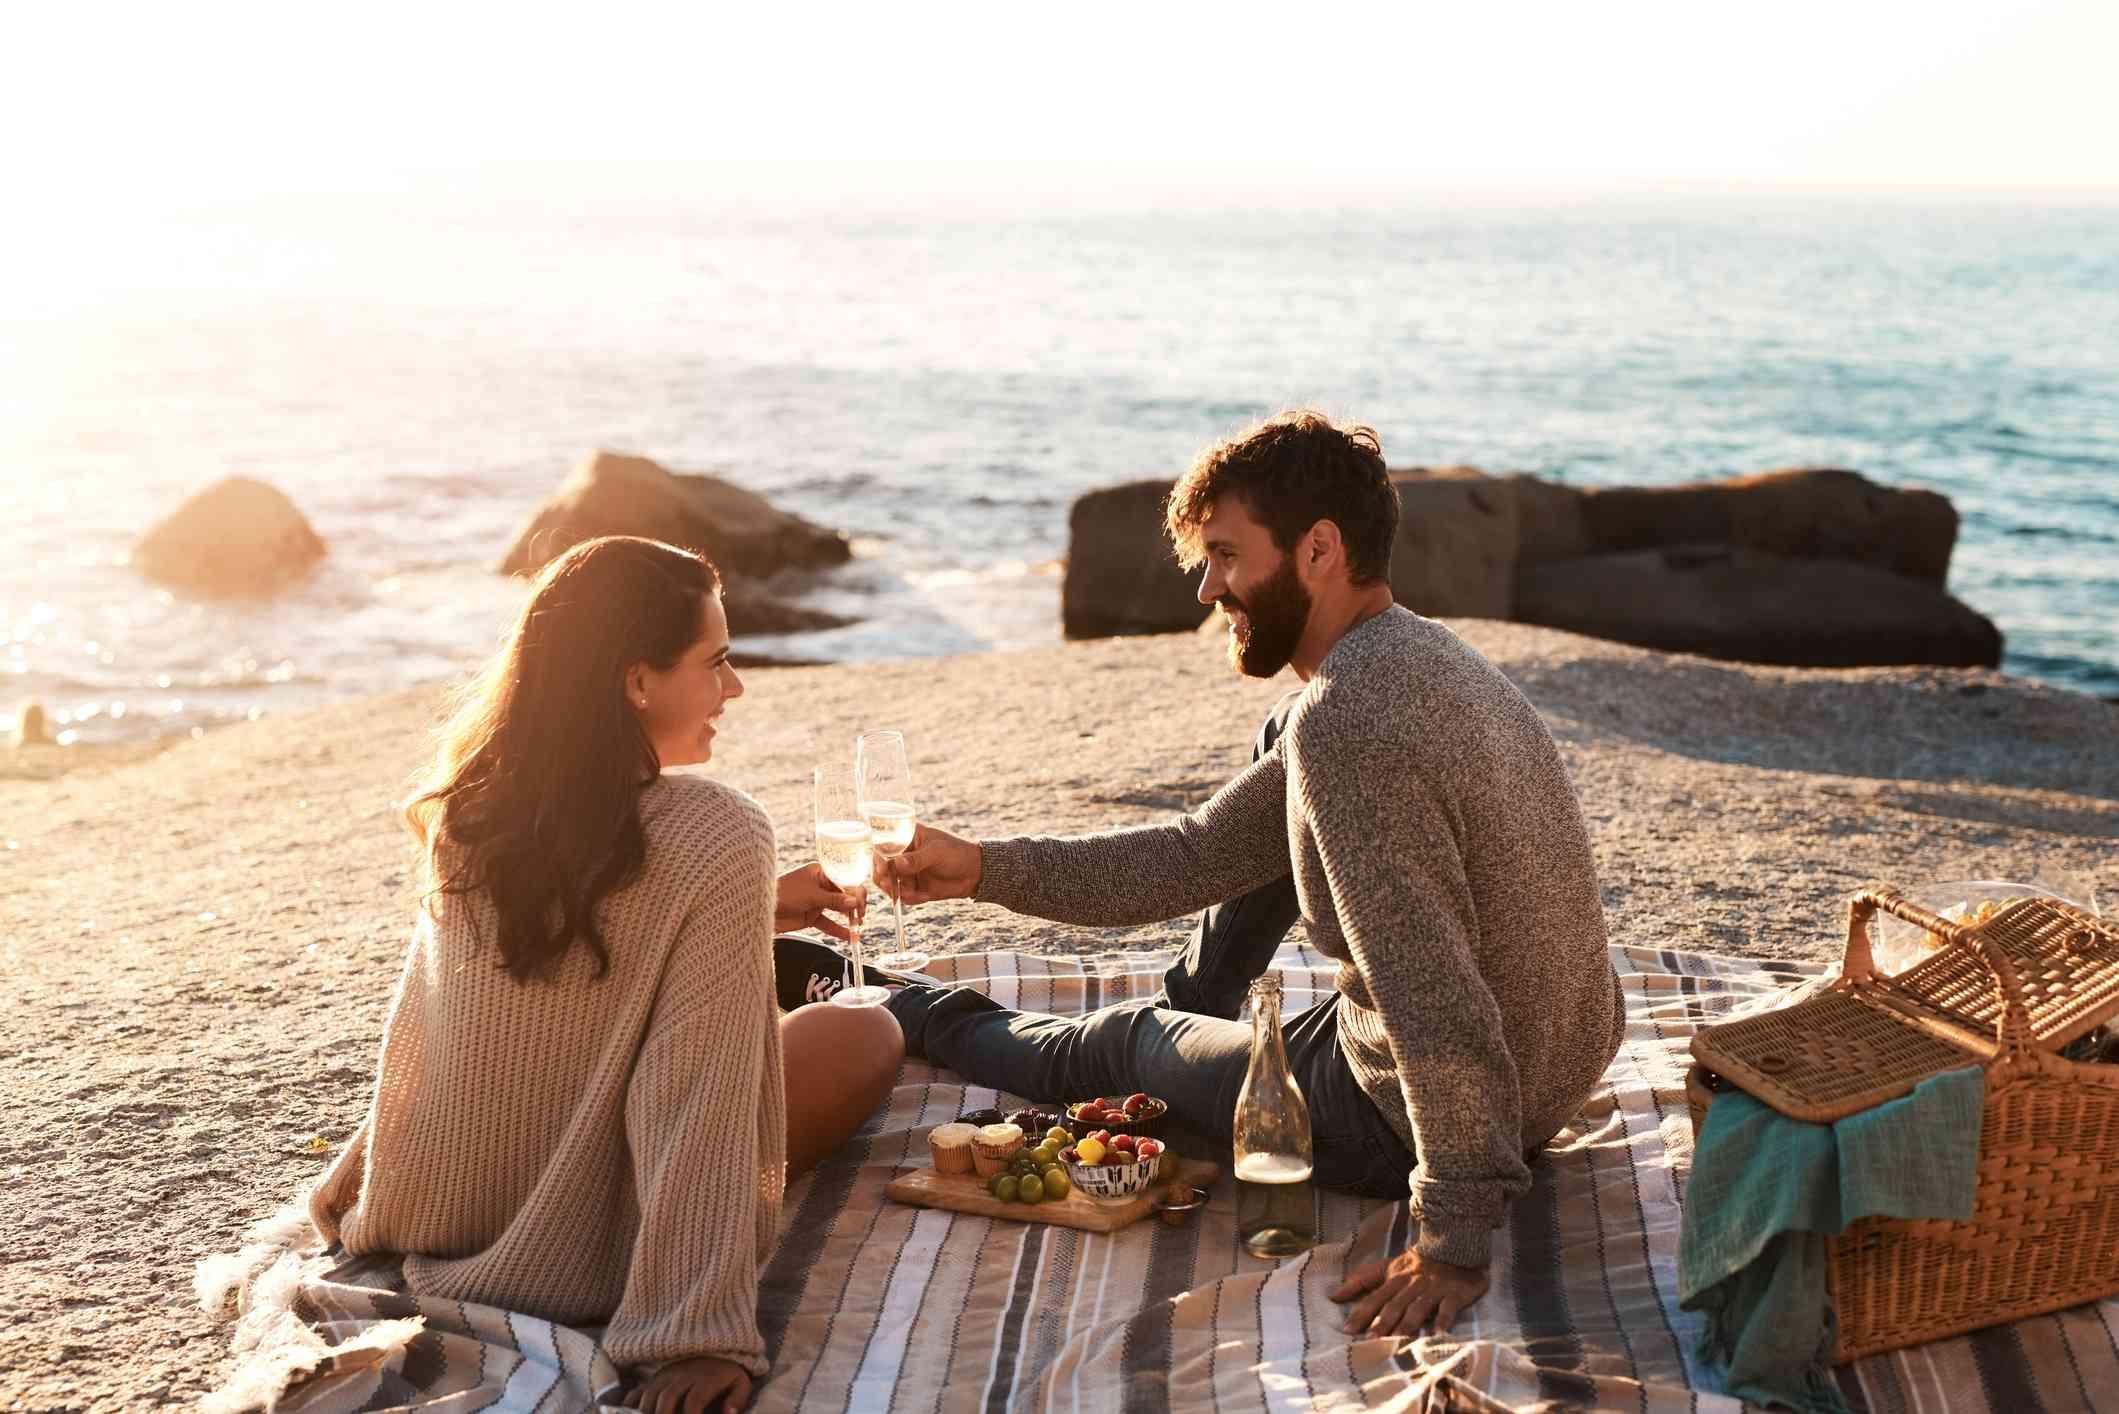 Couple enjoying picnic near ocean